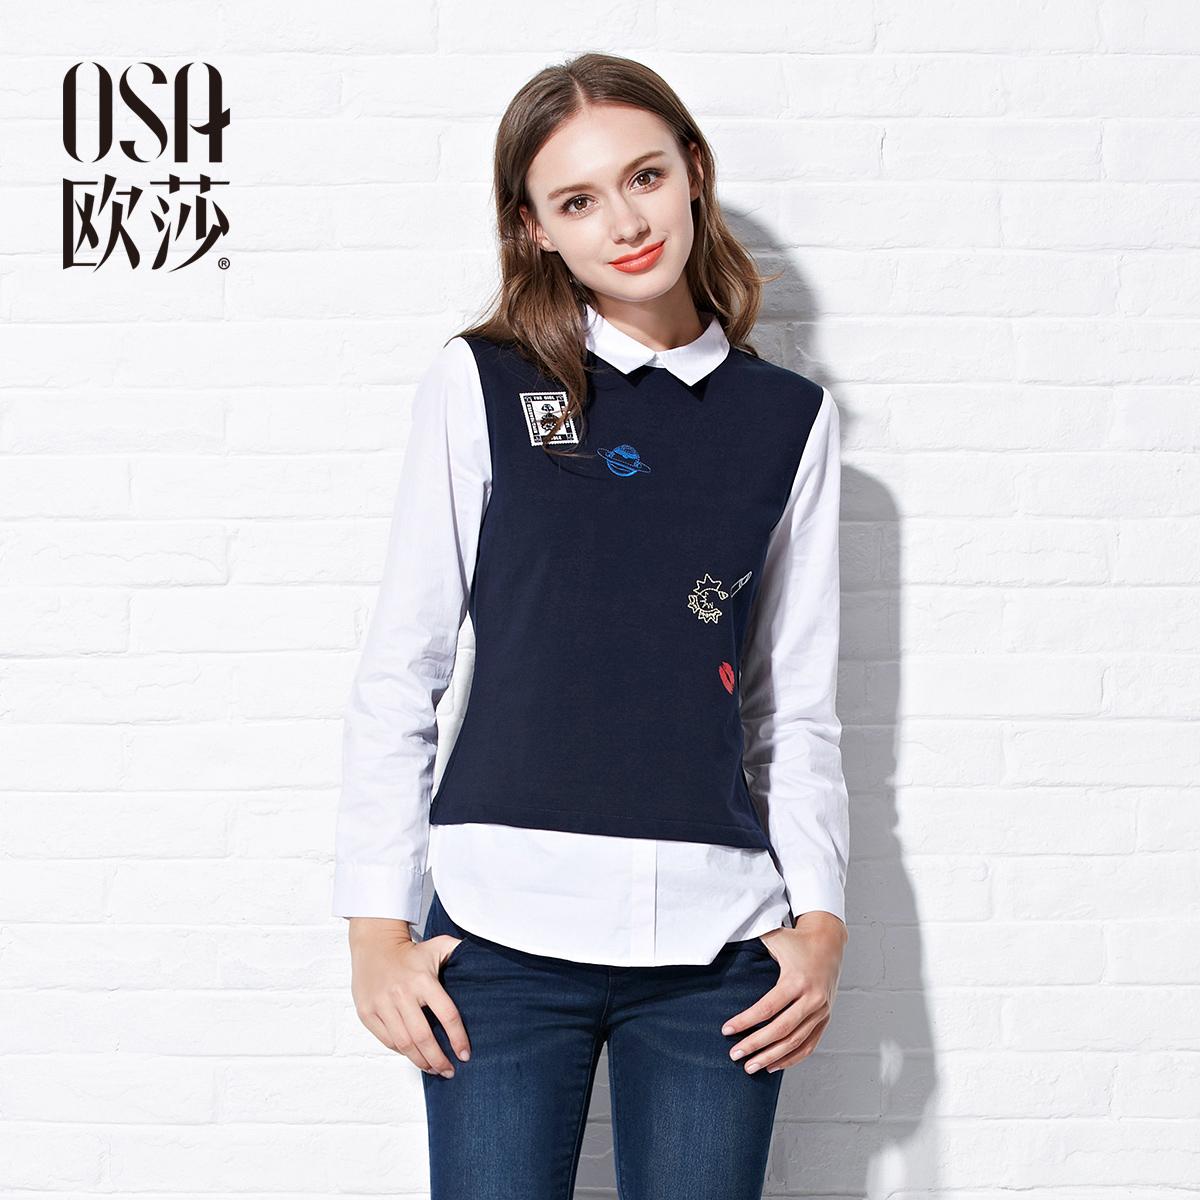 r.beauty秋新款韩版女装复古条纹七分喇叭袖休闲T恤衫r16C8399